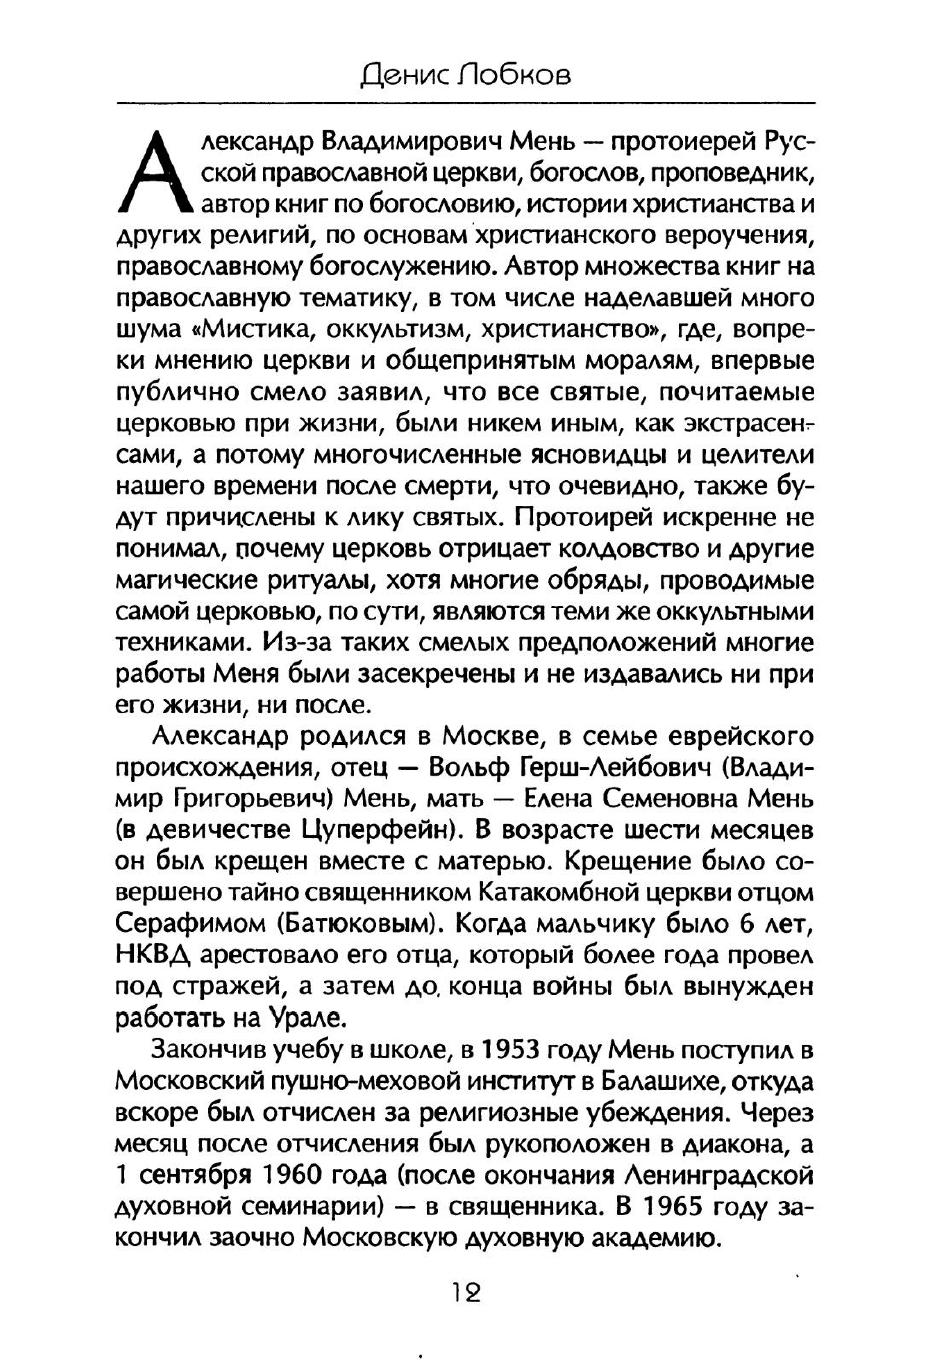 http://images.vfl.ru/ii/1407266715/5ea83184/5908731.jpg